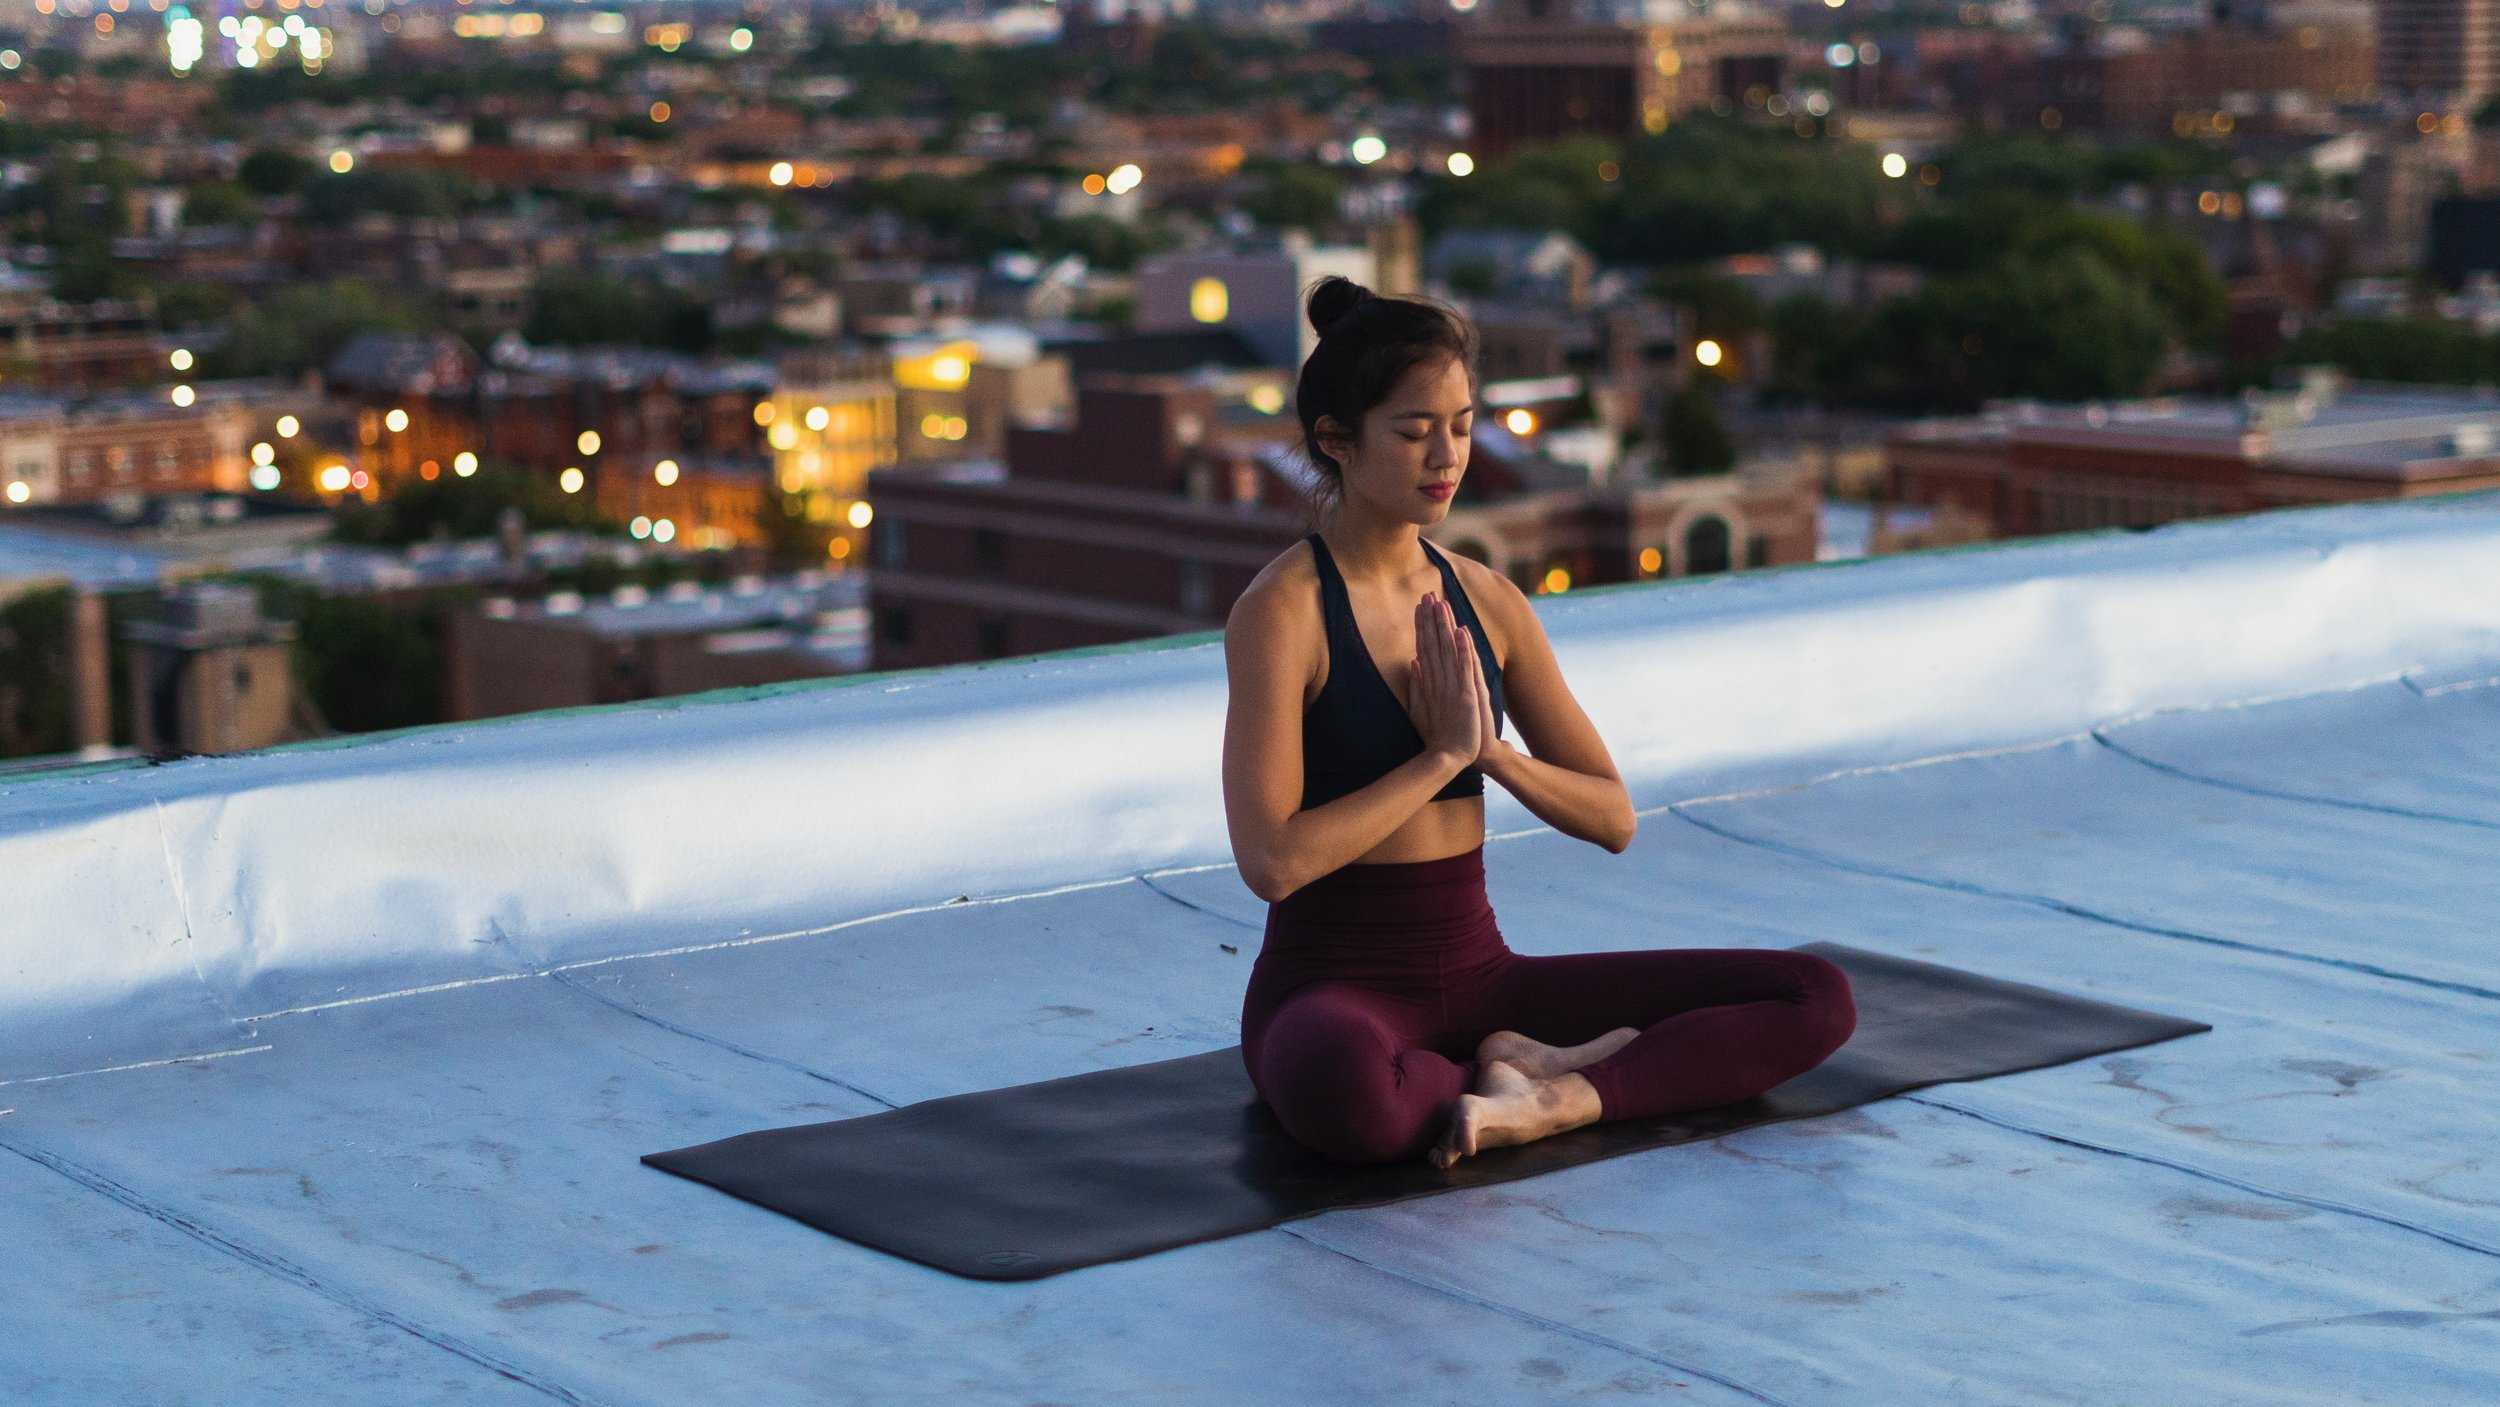 eat stretch nap mindfulness monday